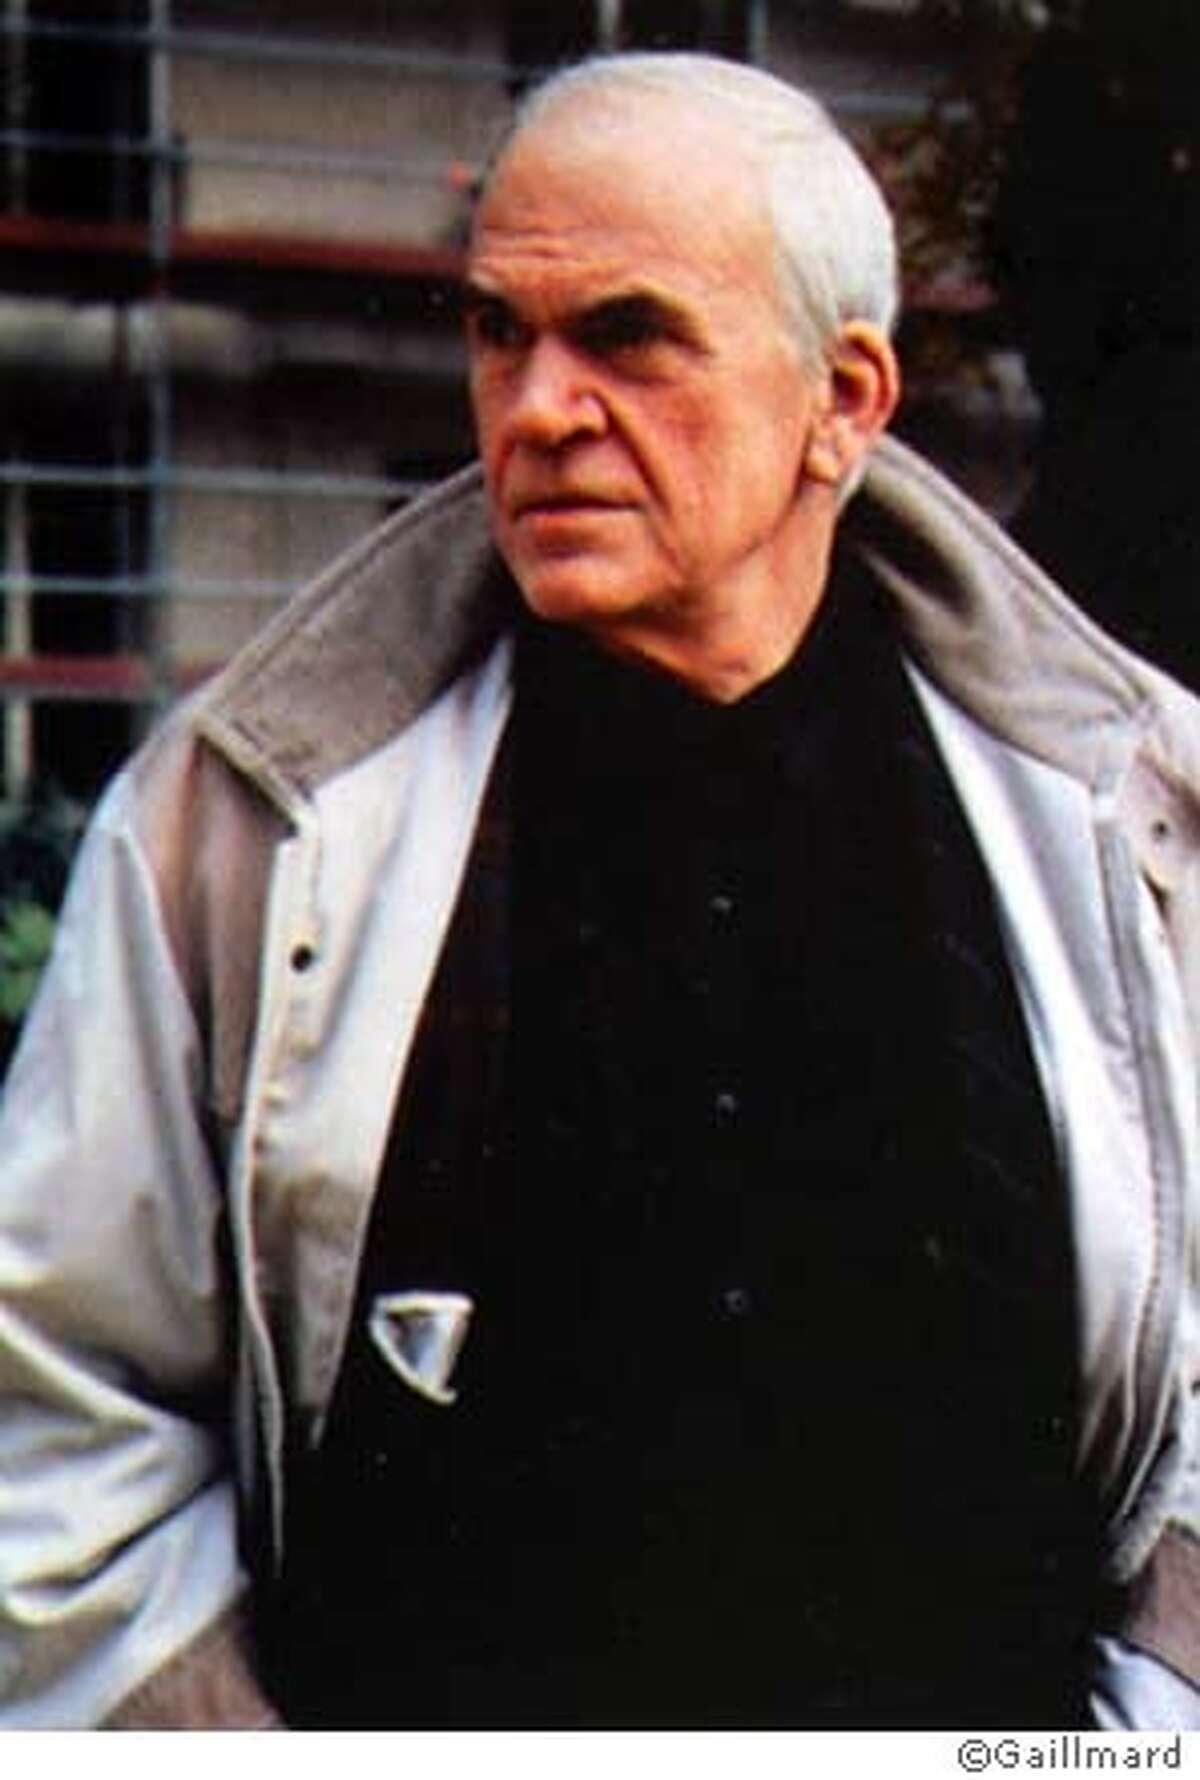 Milan Kundera. Photo copyright Gaillmard